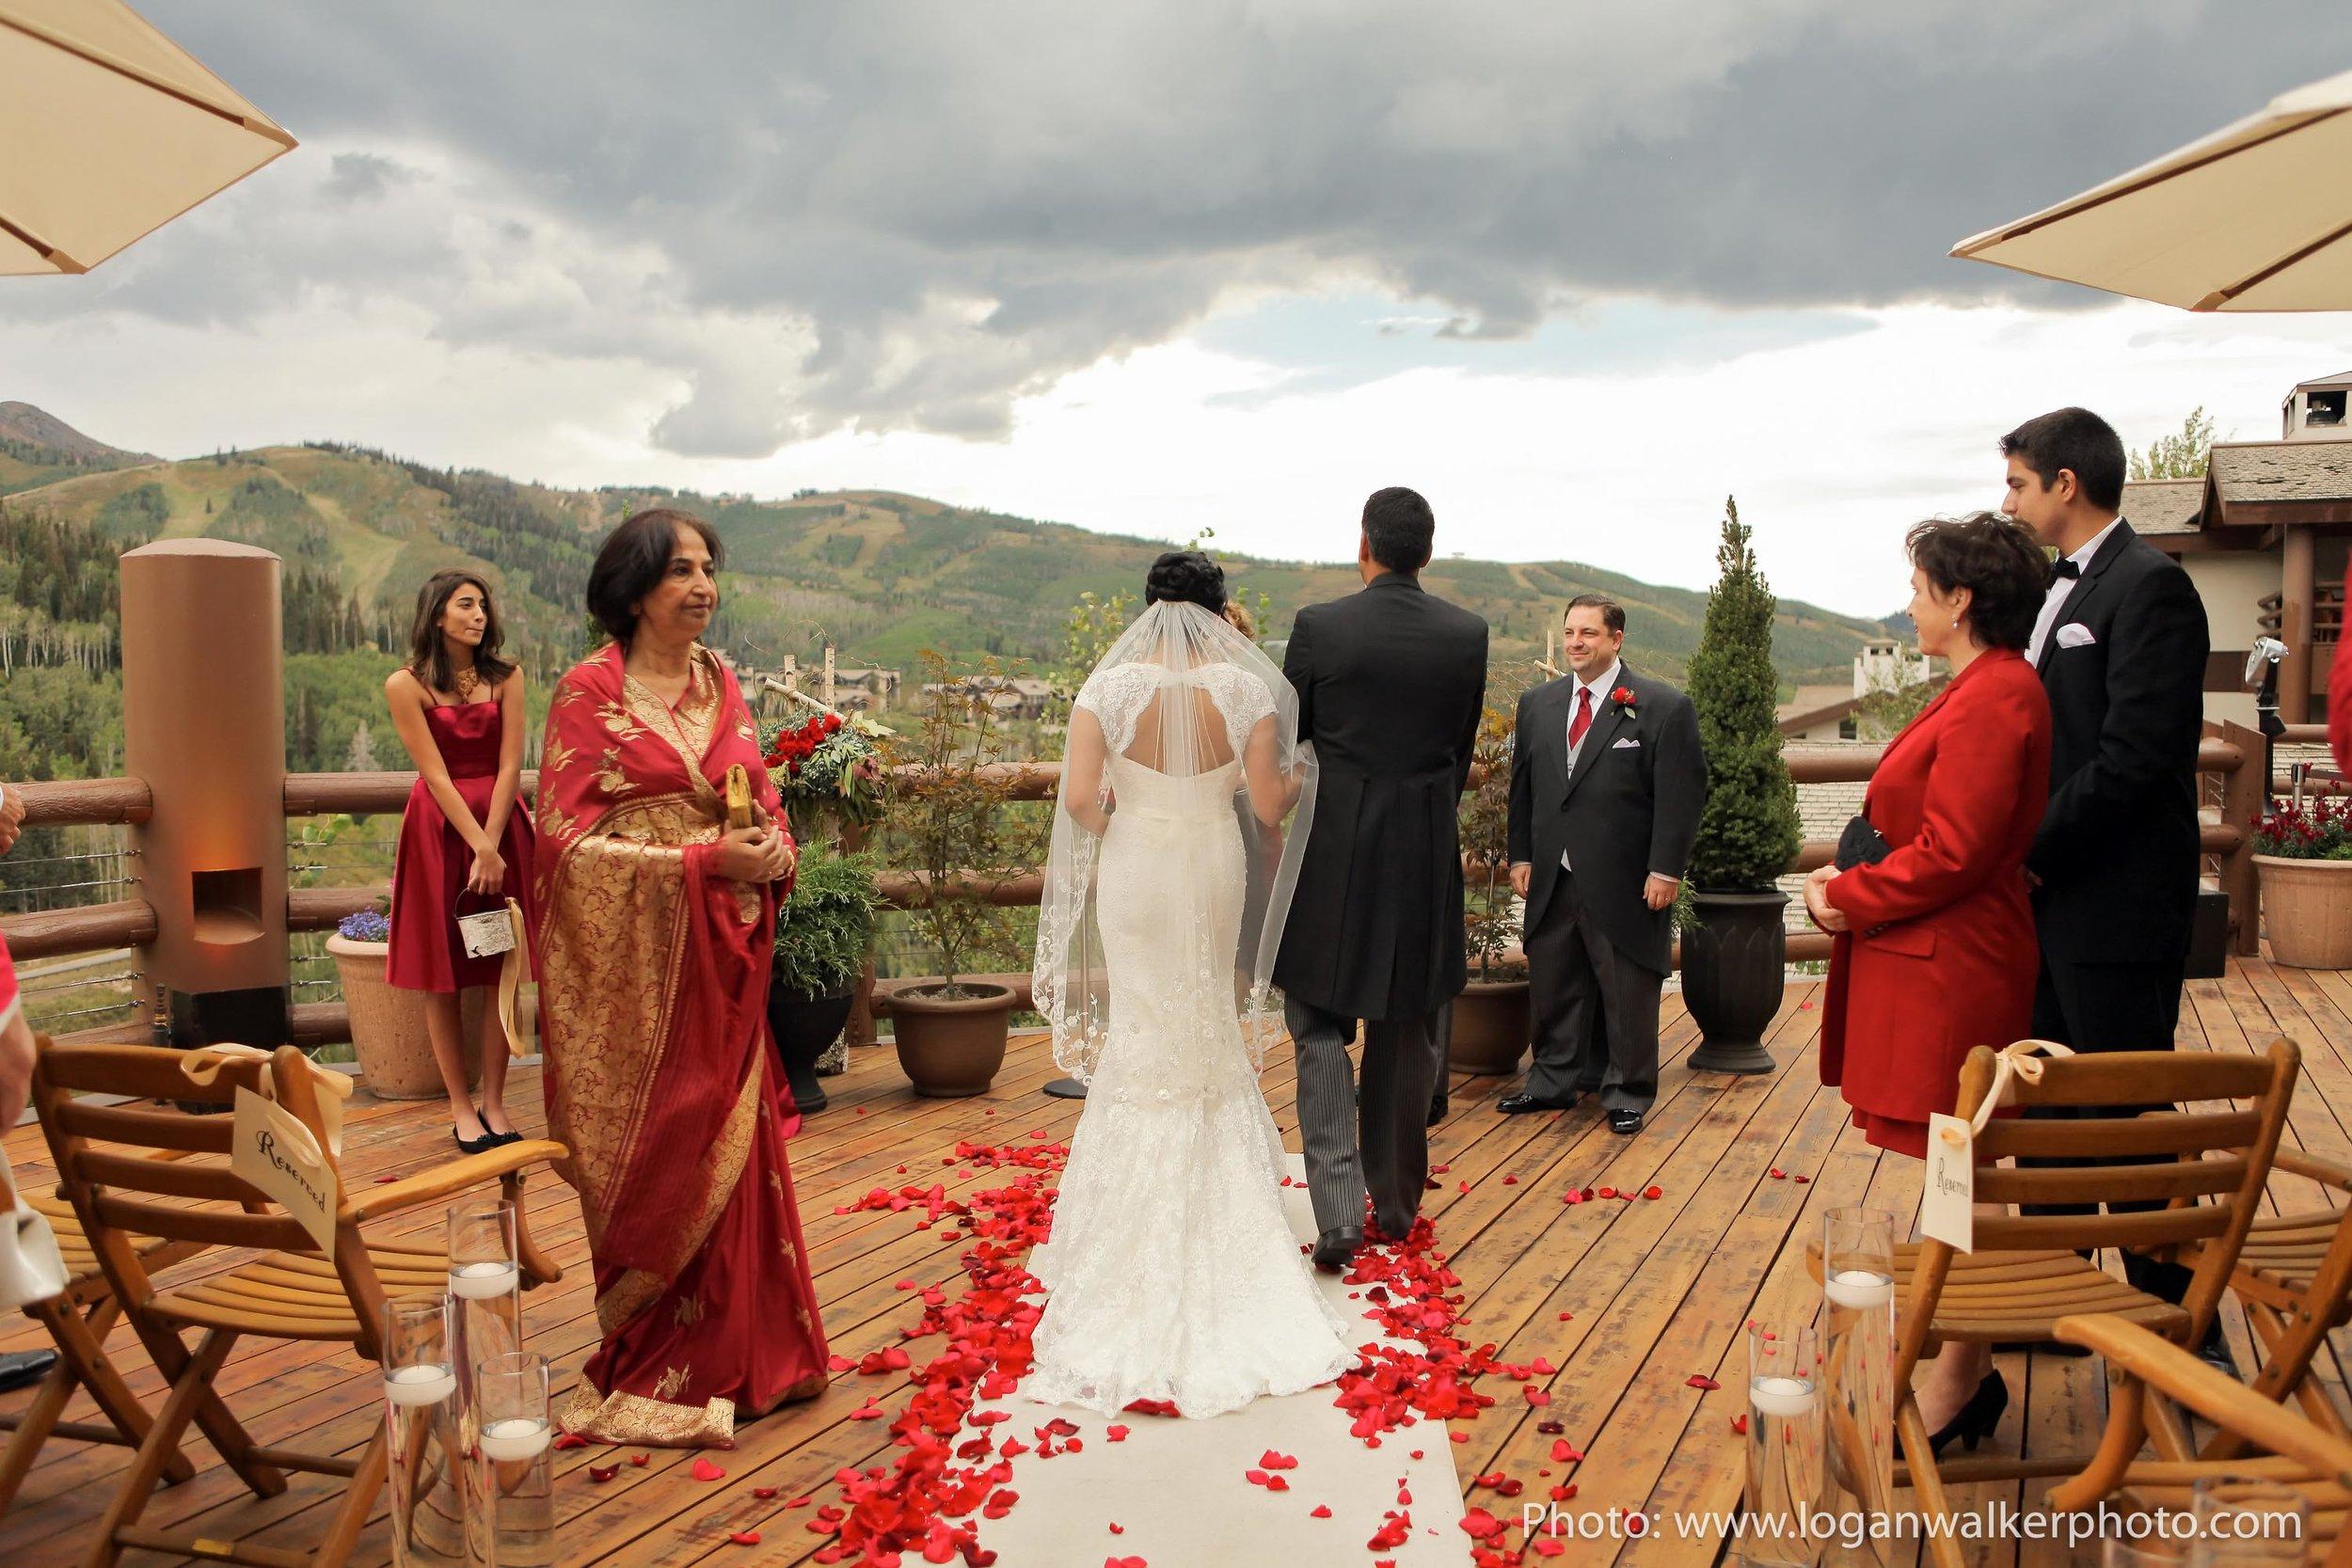 Fall Weddings Park City Stein Eriksen Lodge-0395-2.jpg